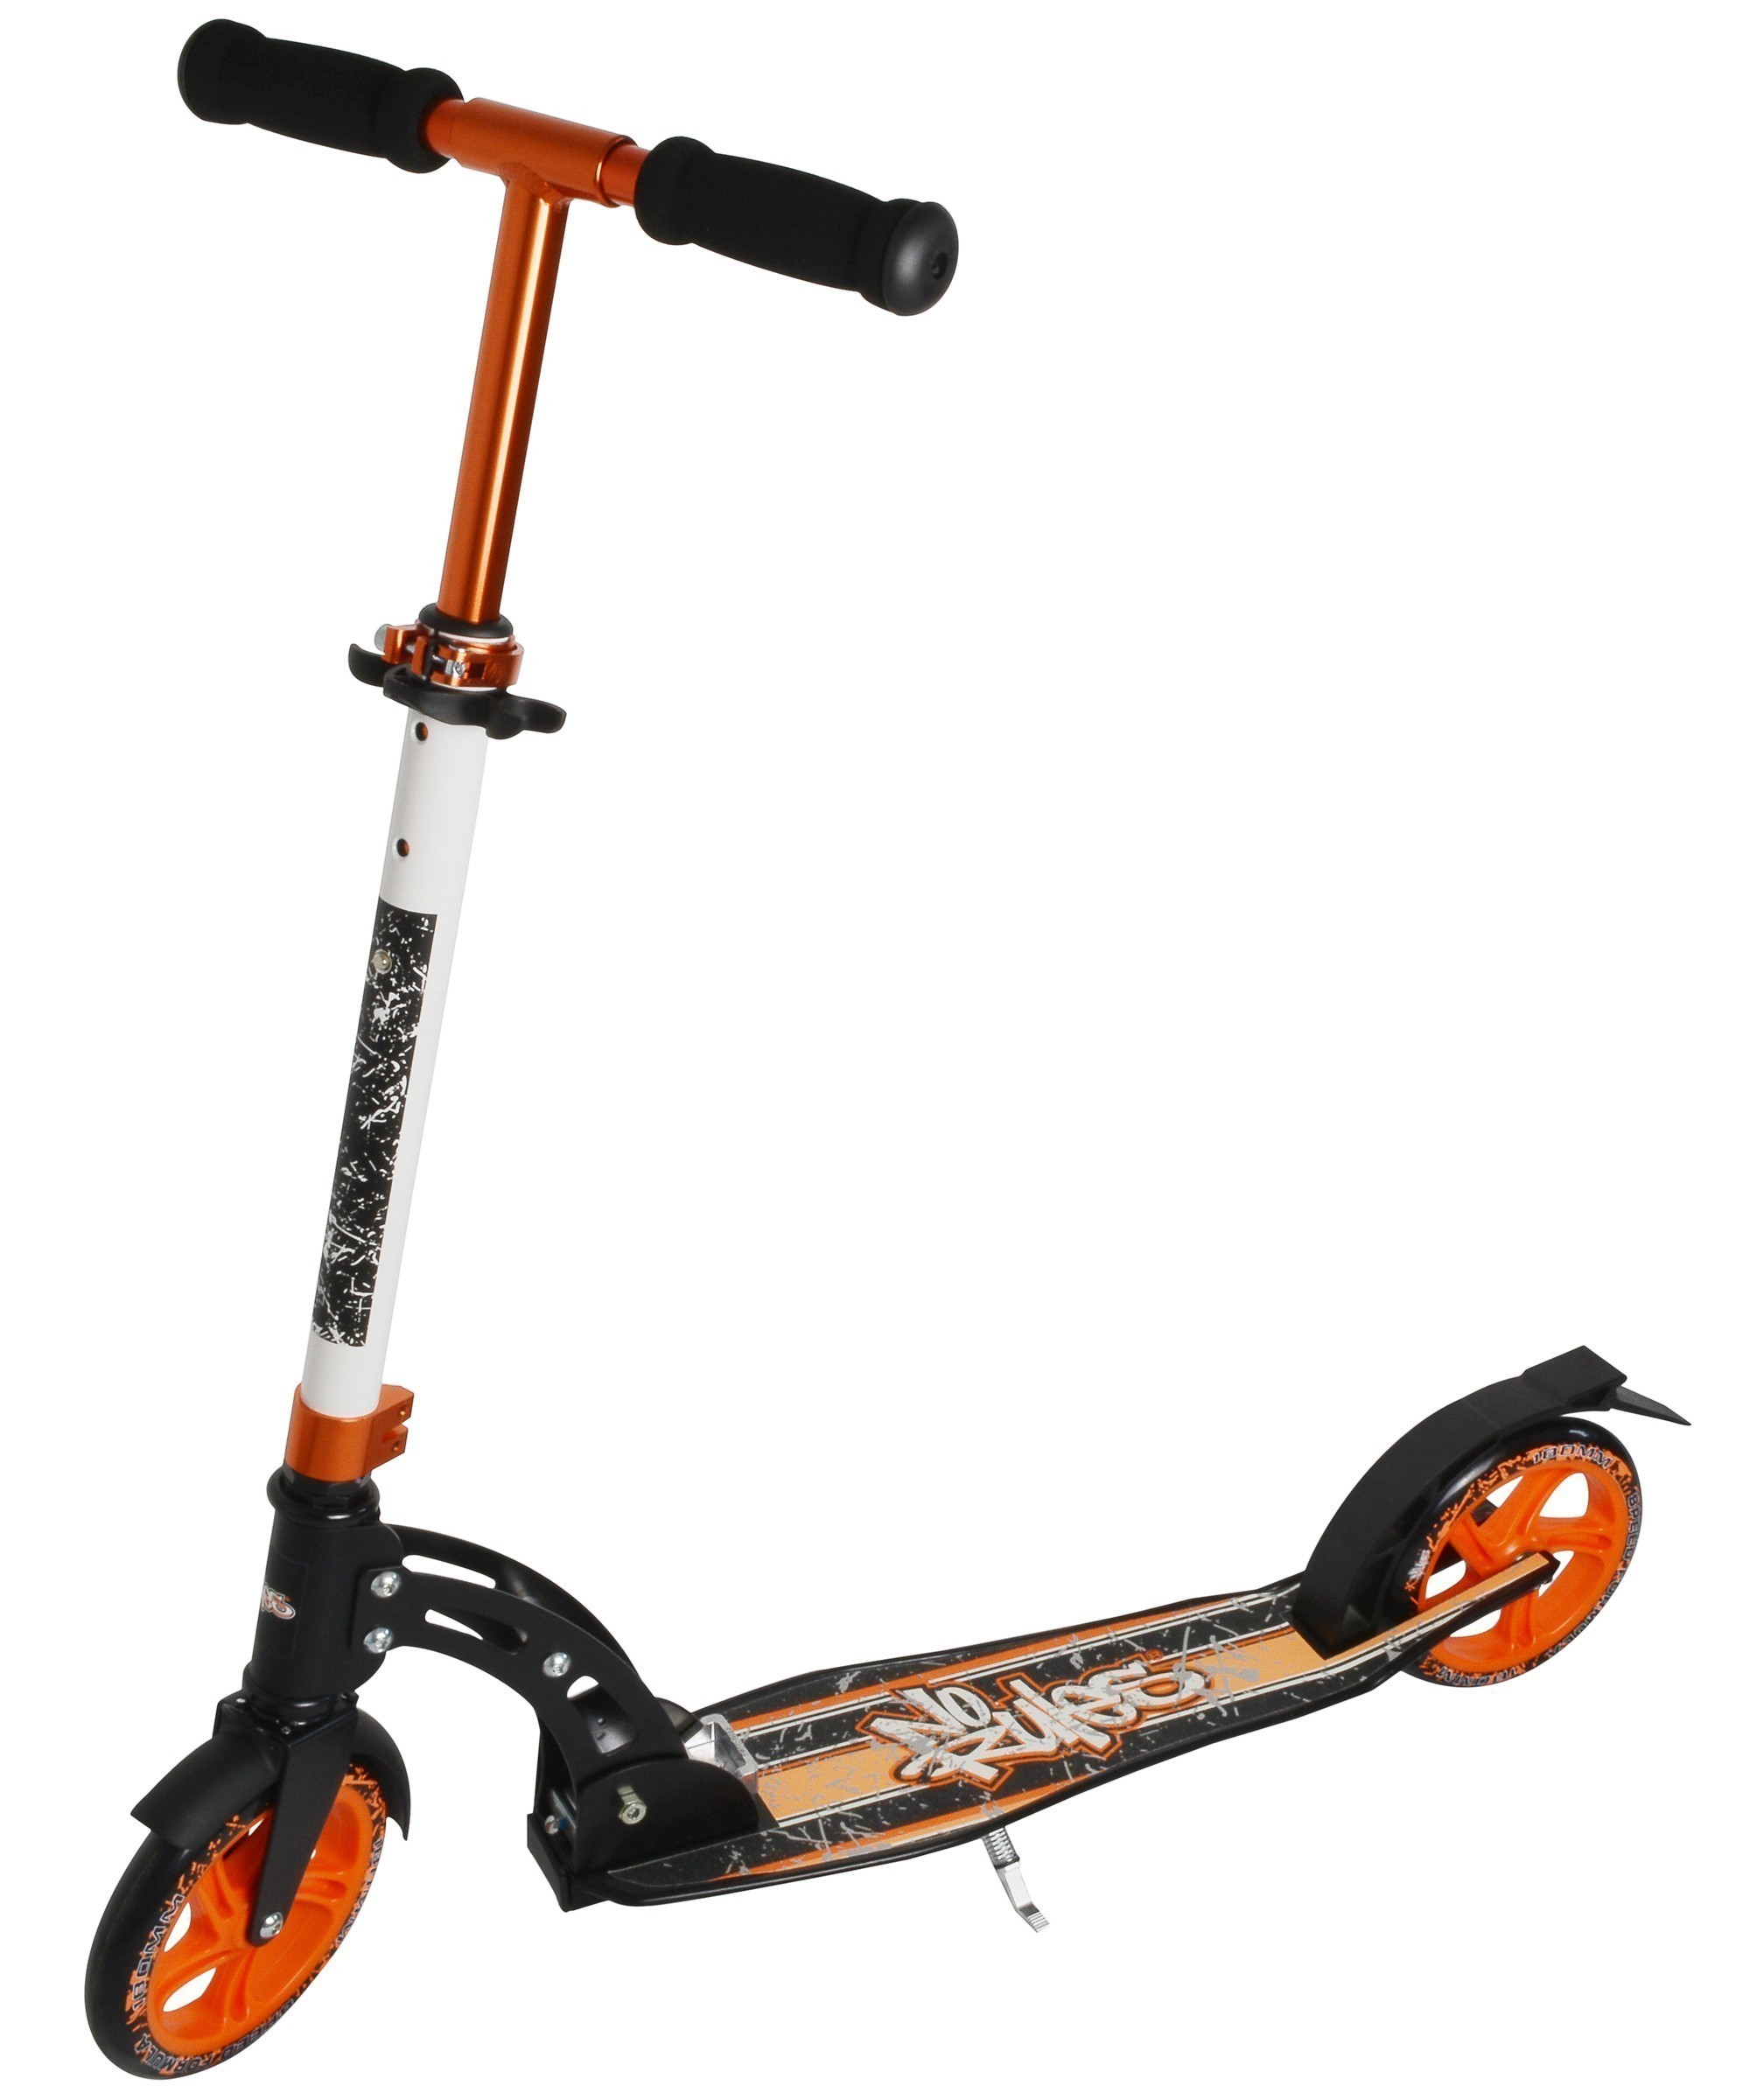 Alu Scooter / Cityroller No Rules 180 orange schwarz Bild 4